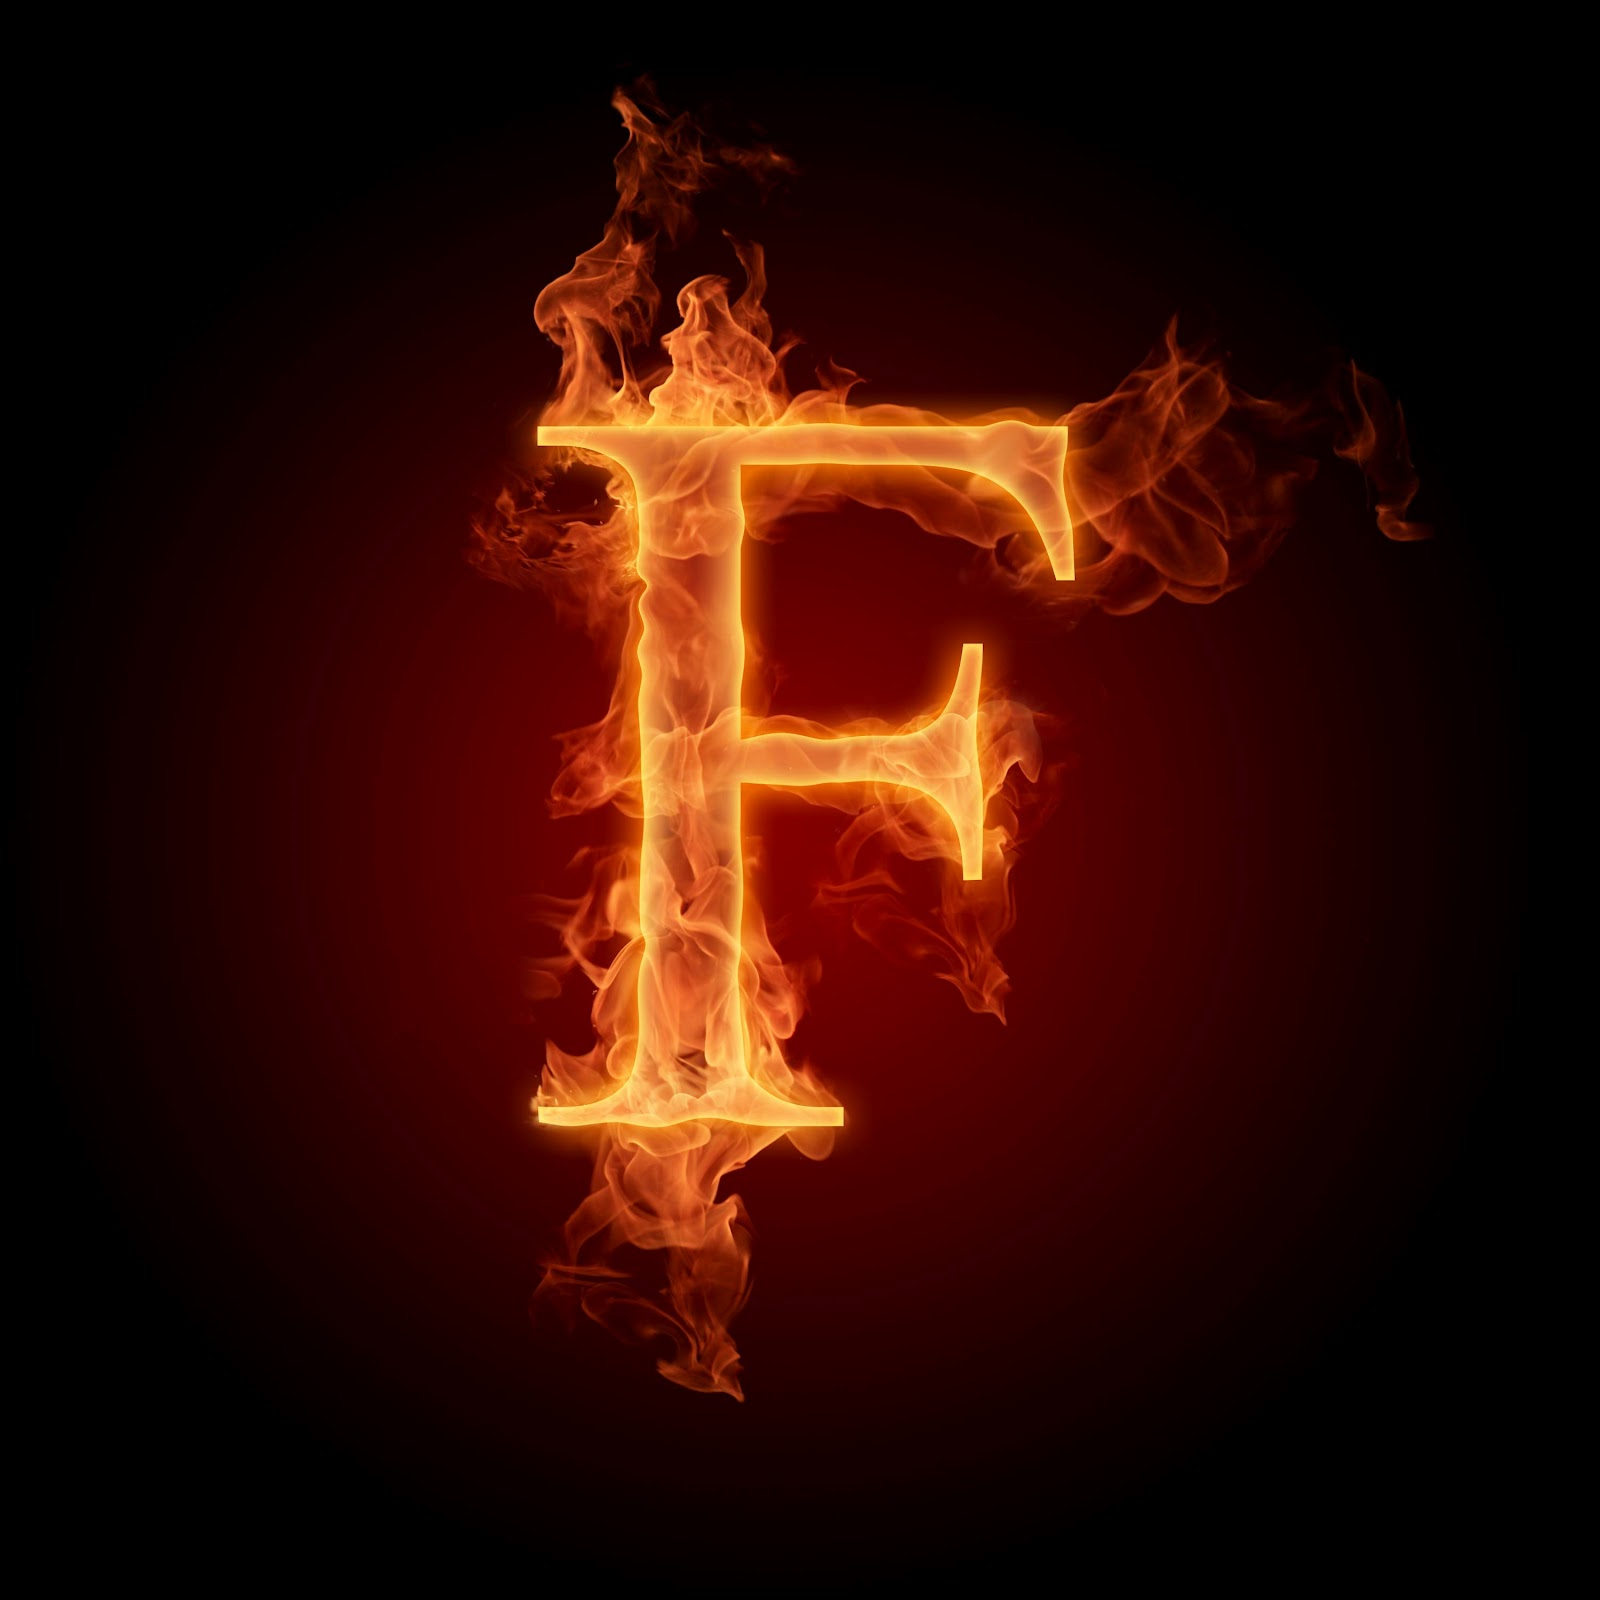 http://2.bp.blogspot.com/-Whr1ZHND16I/UB0yaO25-aI/AAAAAAAAAJc/1KV1qzYLx0k/s1600/Burning%2BAlphabet%2BWallpaper%2BF.jpg